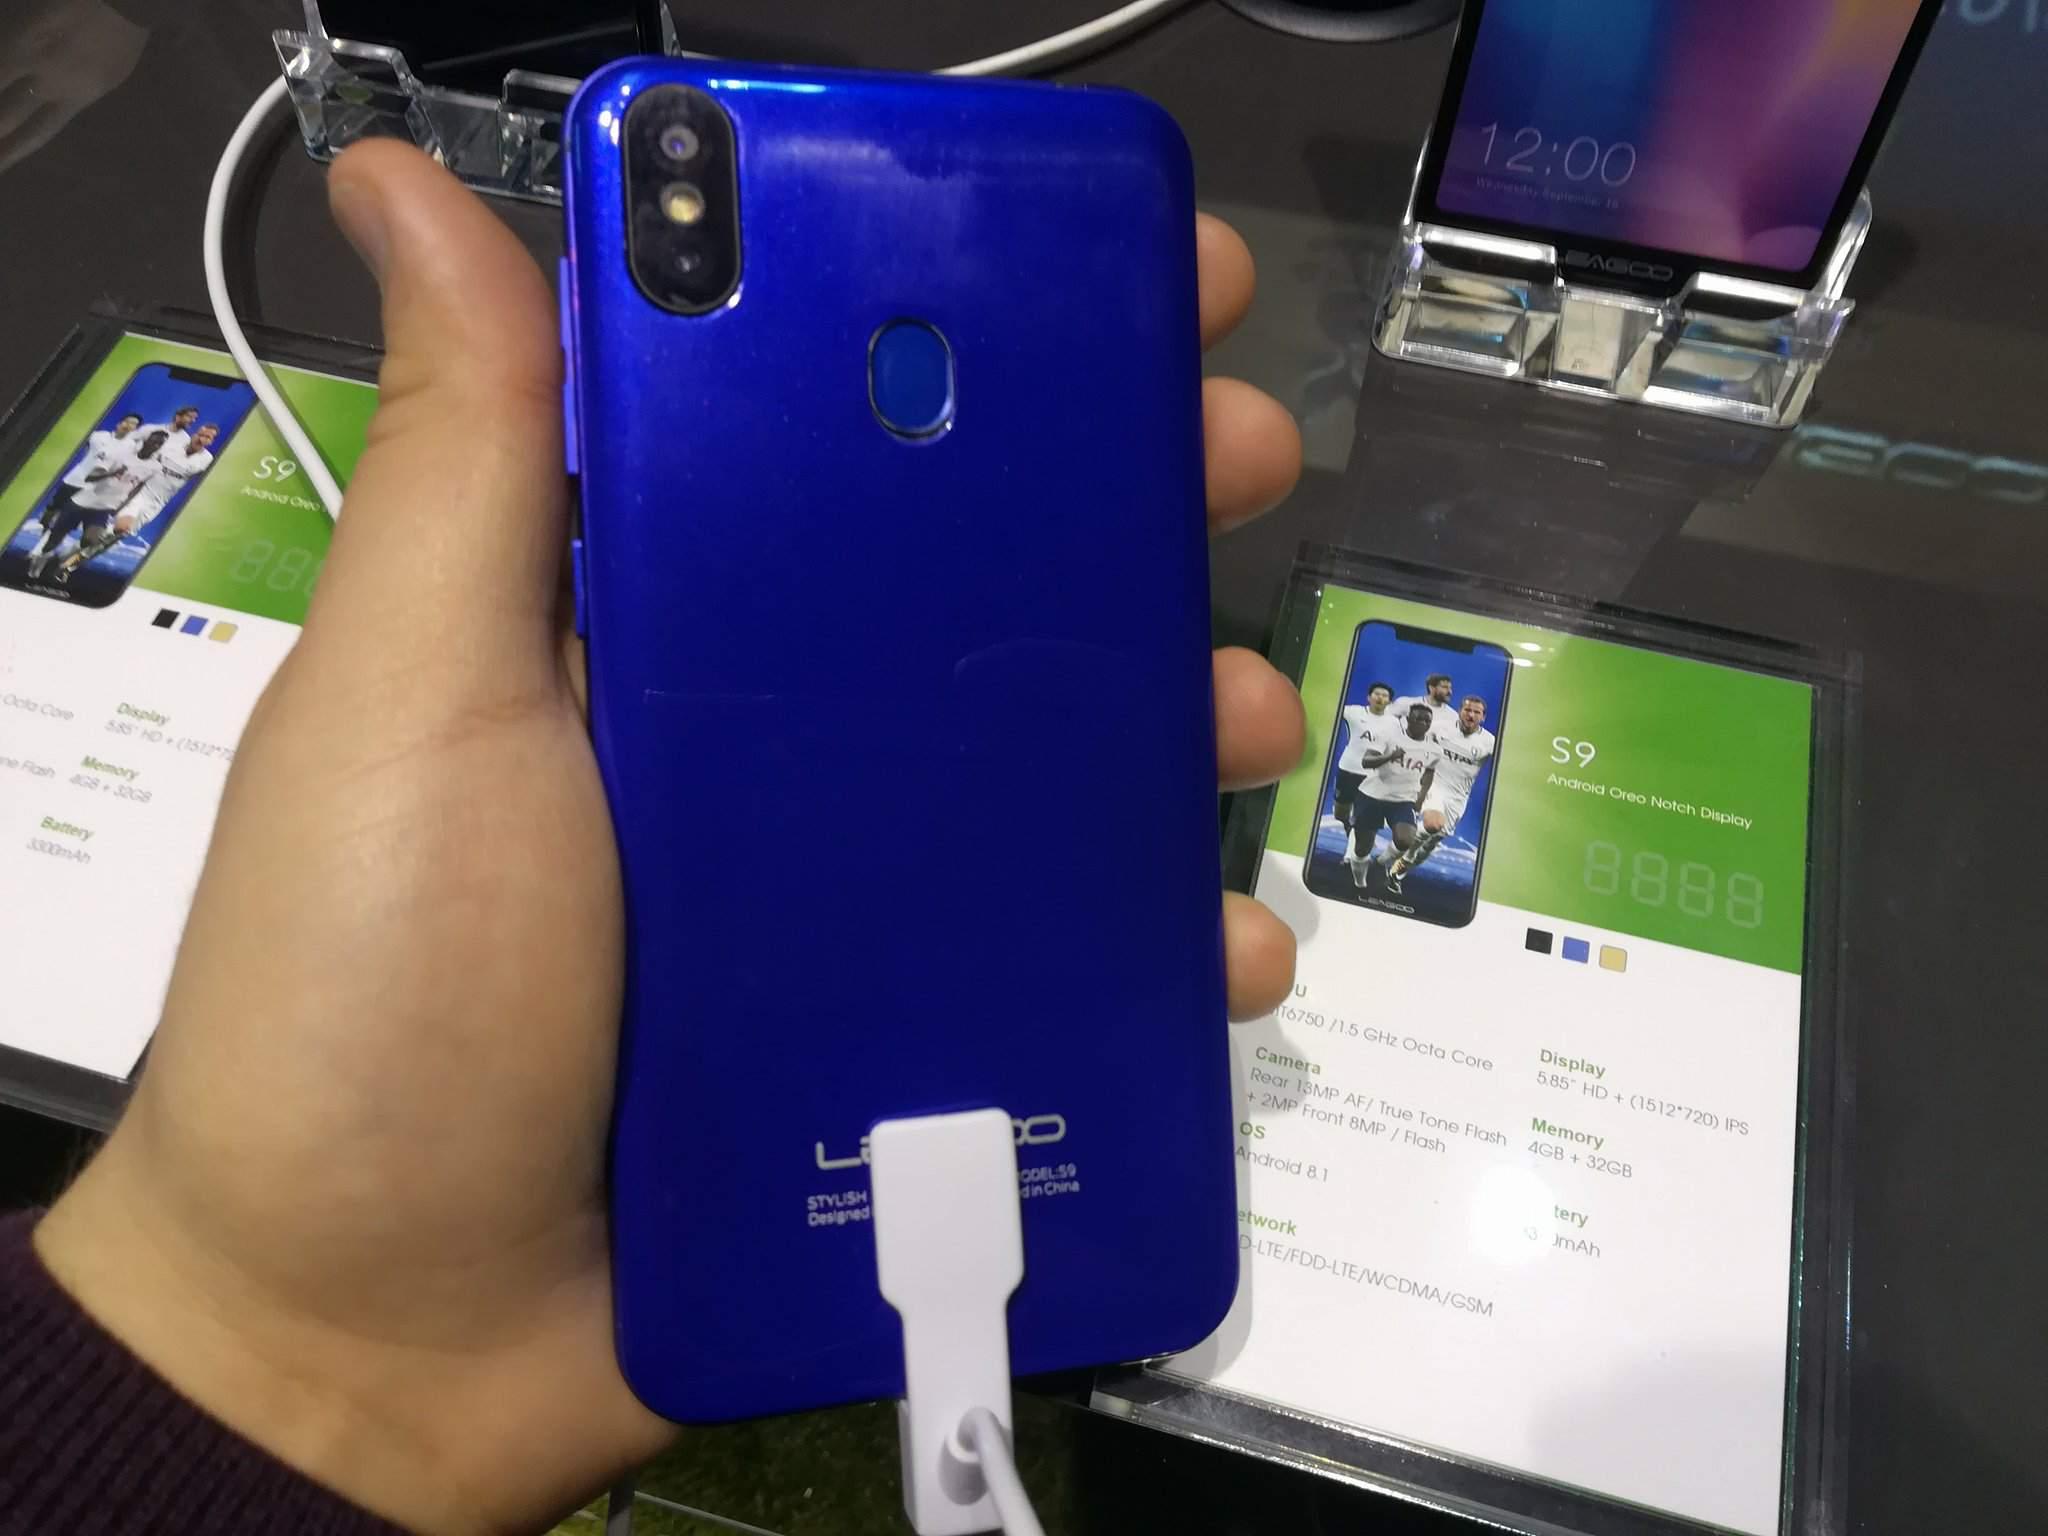 MWC 2018: Leagoo S9